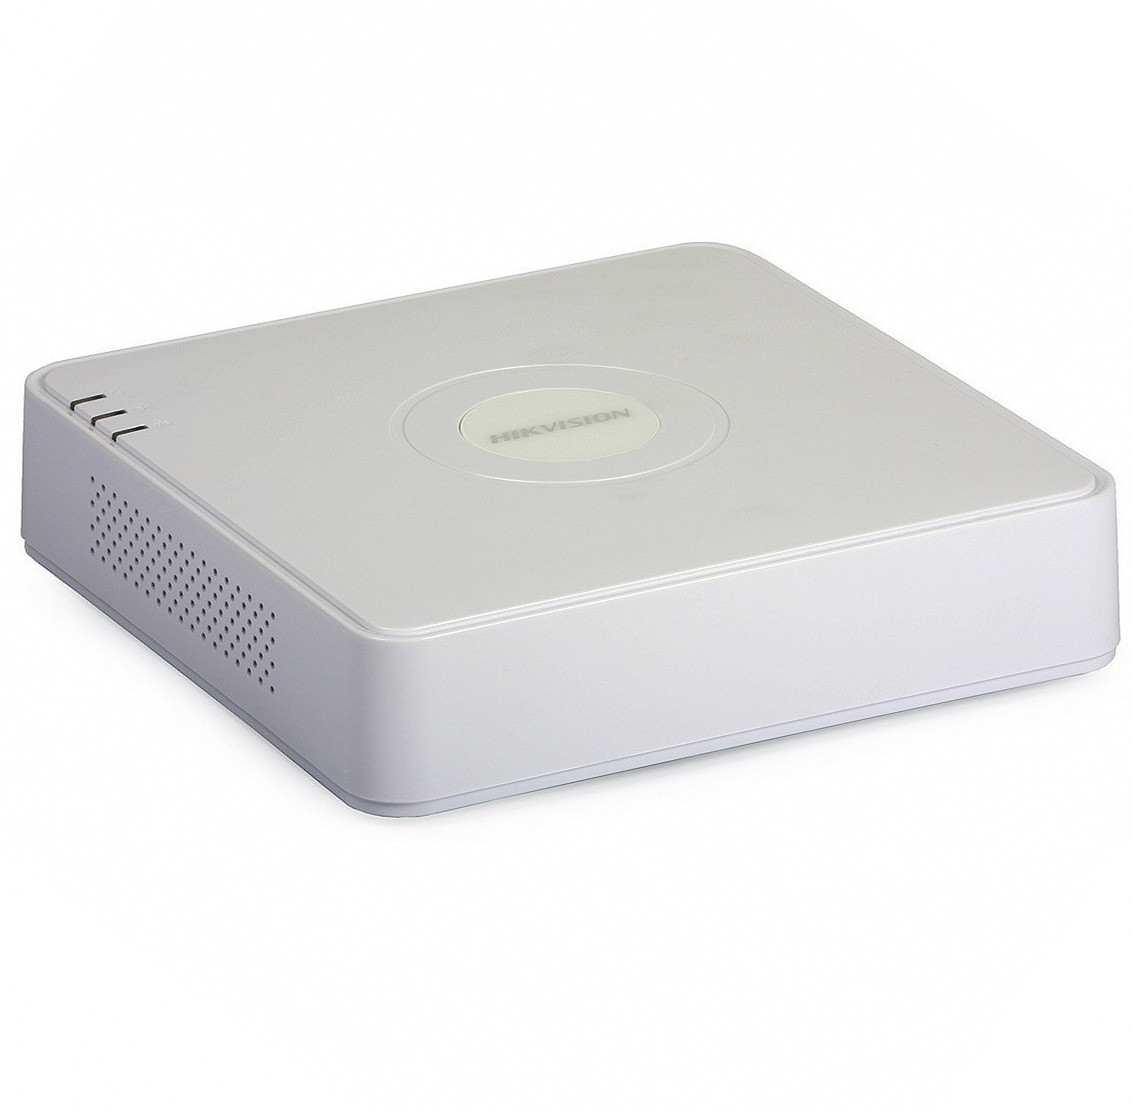 Видеорегистратор Turbo HD Hikvision DS-7108HQHI-F1/N